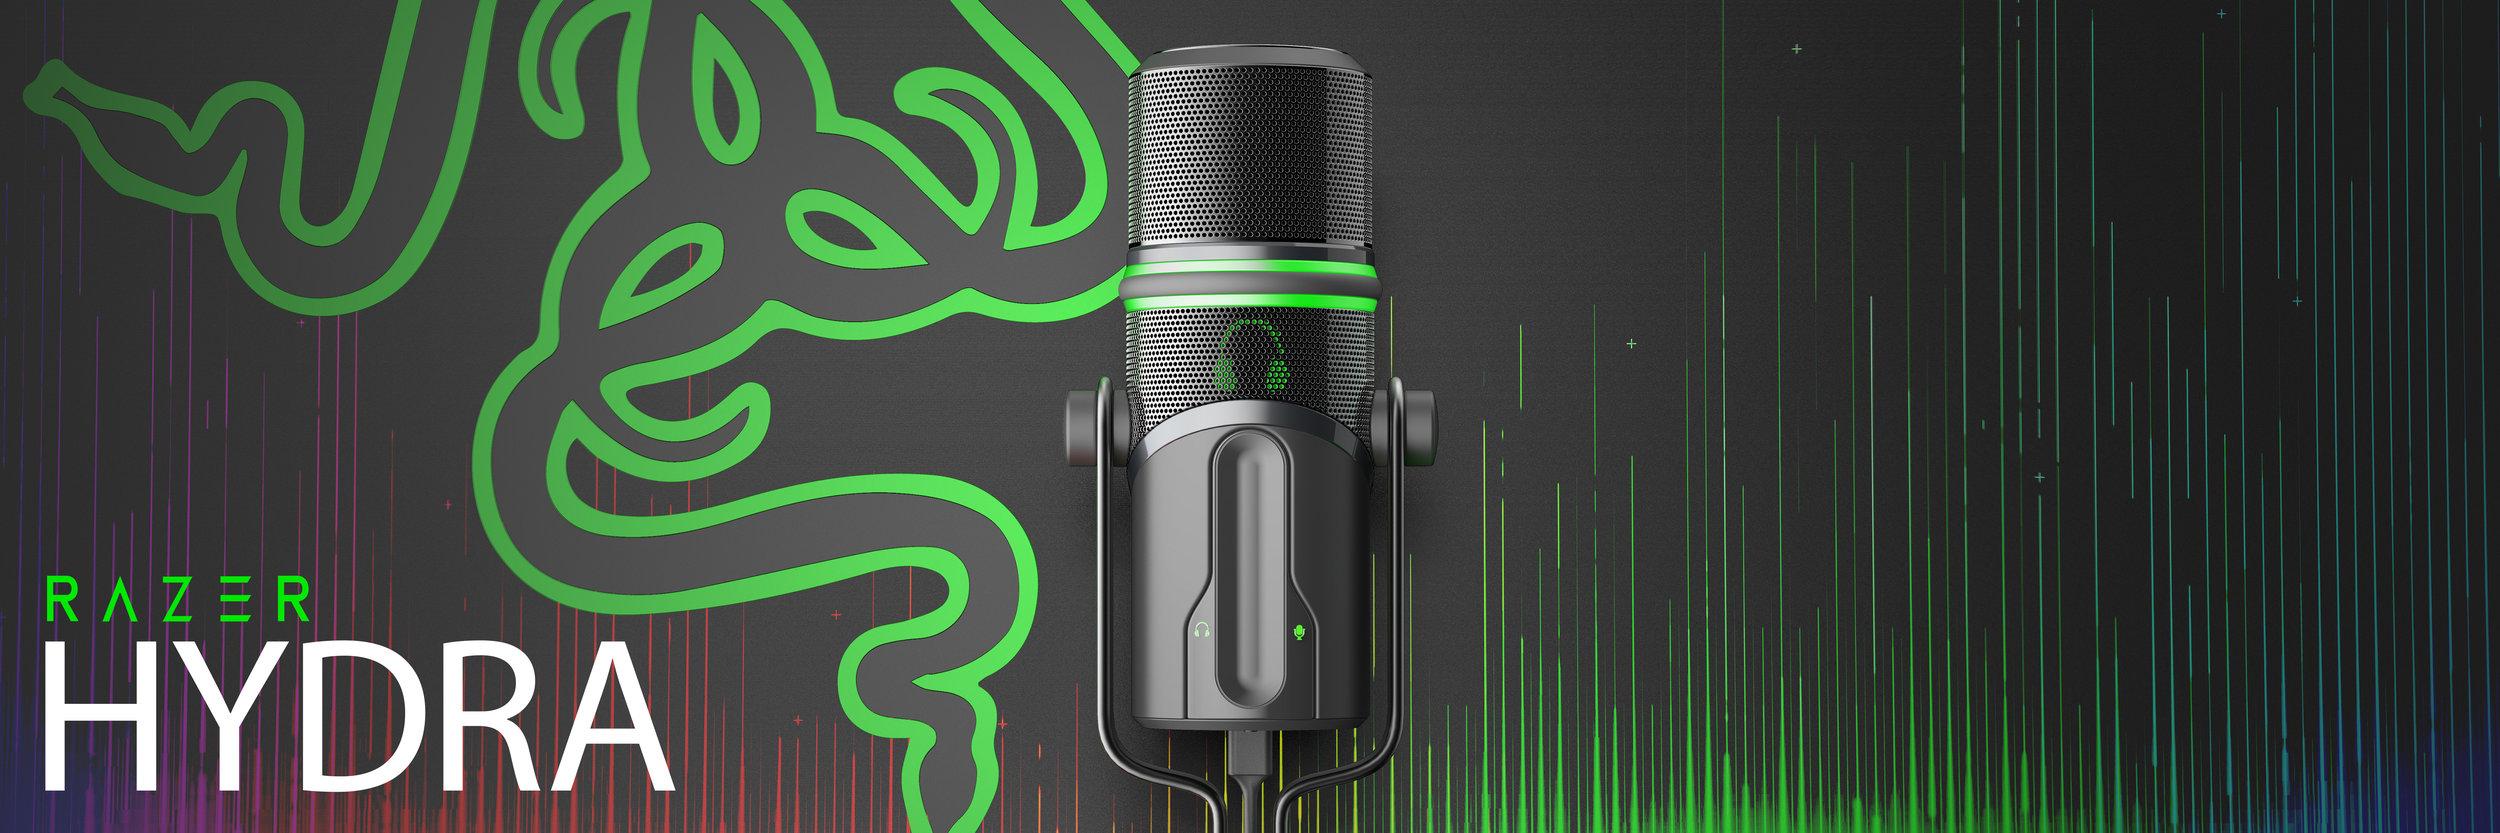 UX Design, Consumer Electronics Design    Razer Hydra    View Project